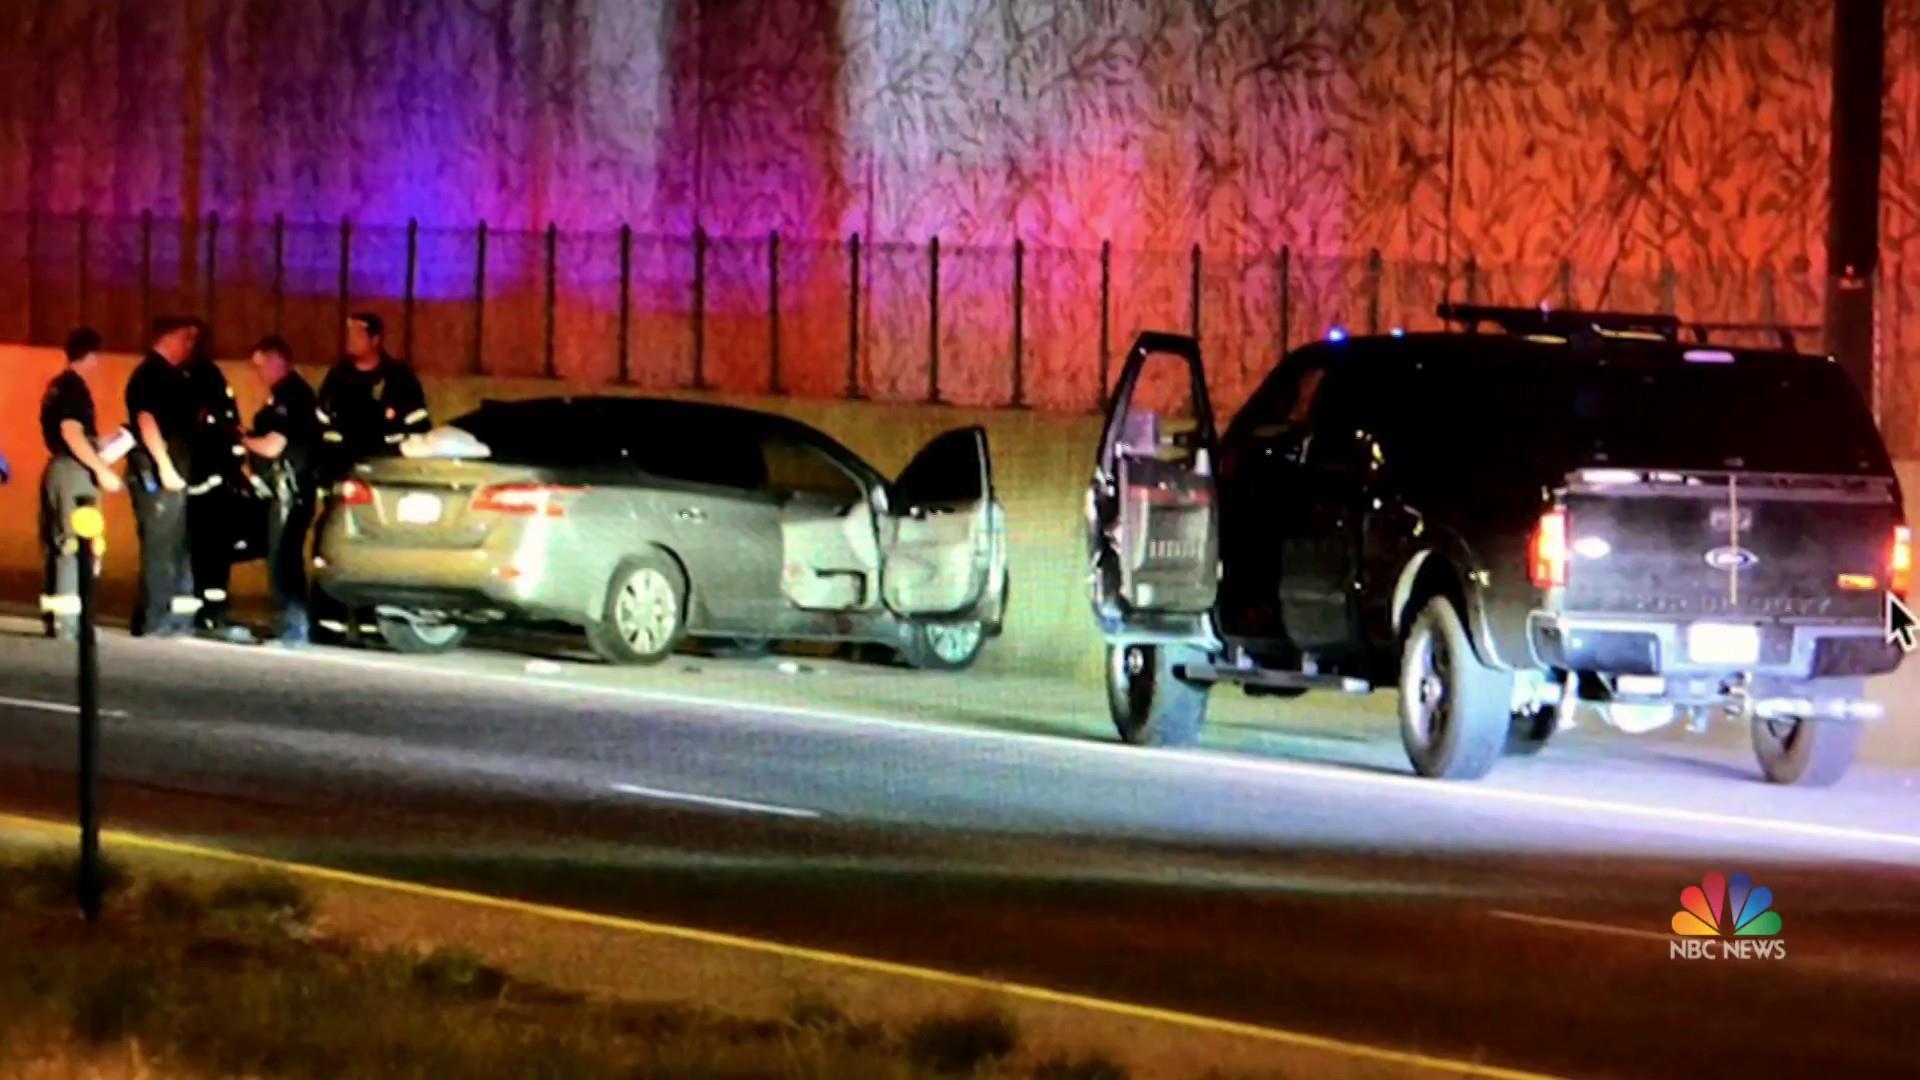 Uber driver arrested on suspicion of murder - NBC News